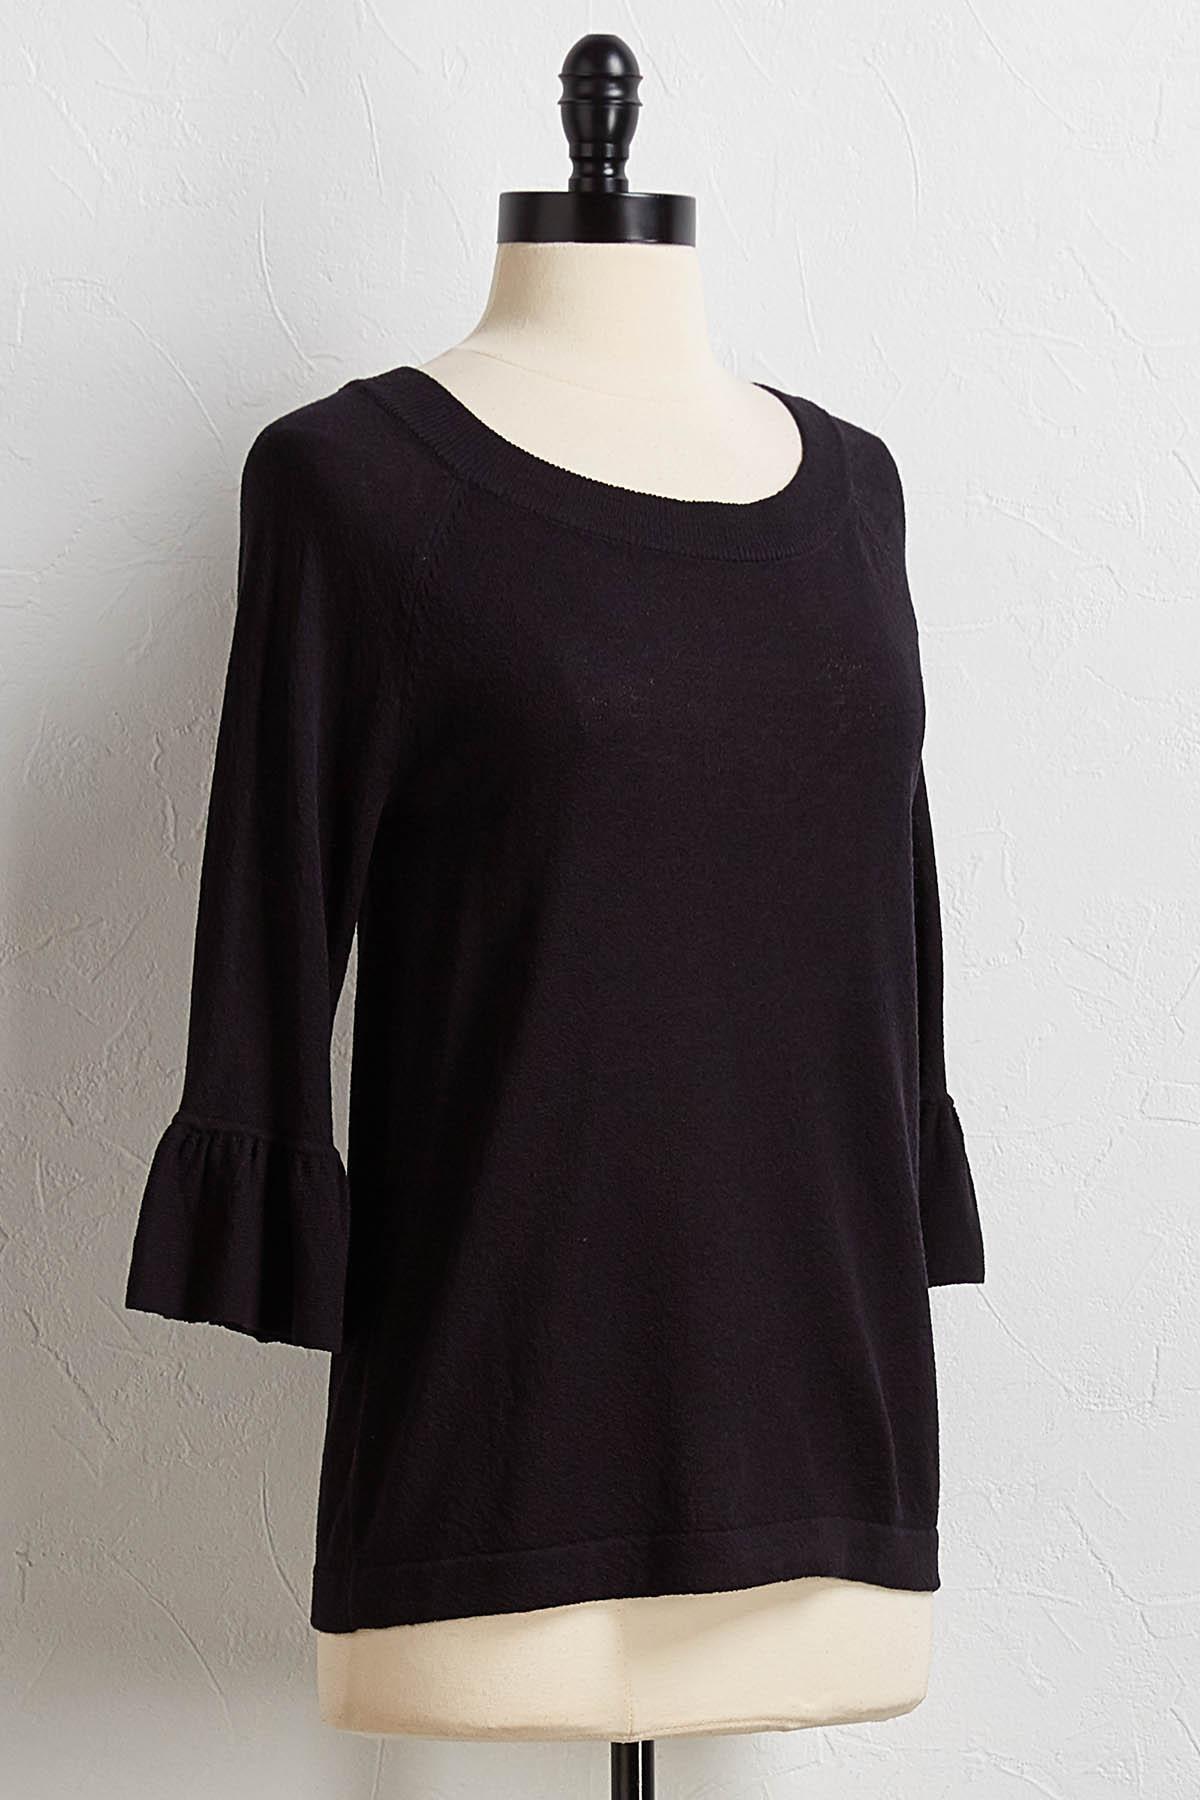 Ruffled Sleeve Sweater